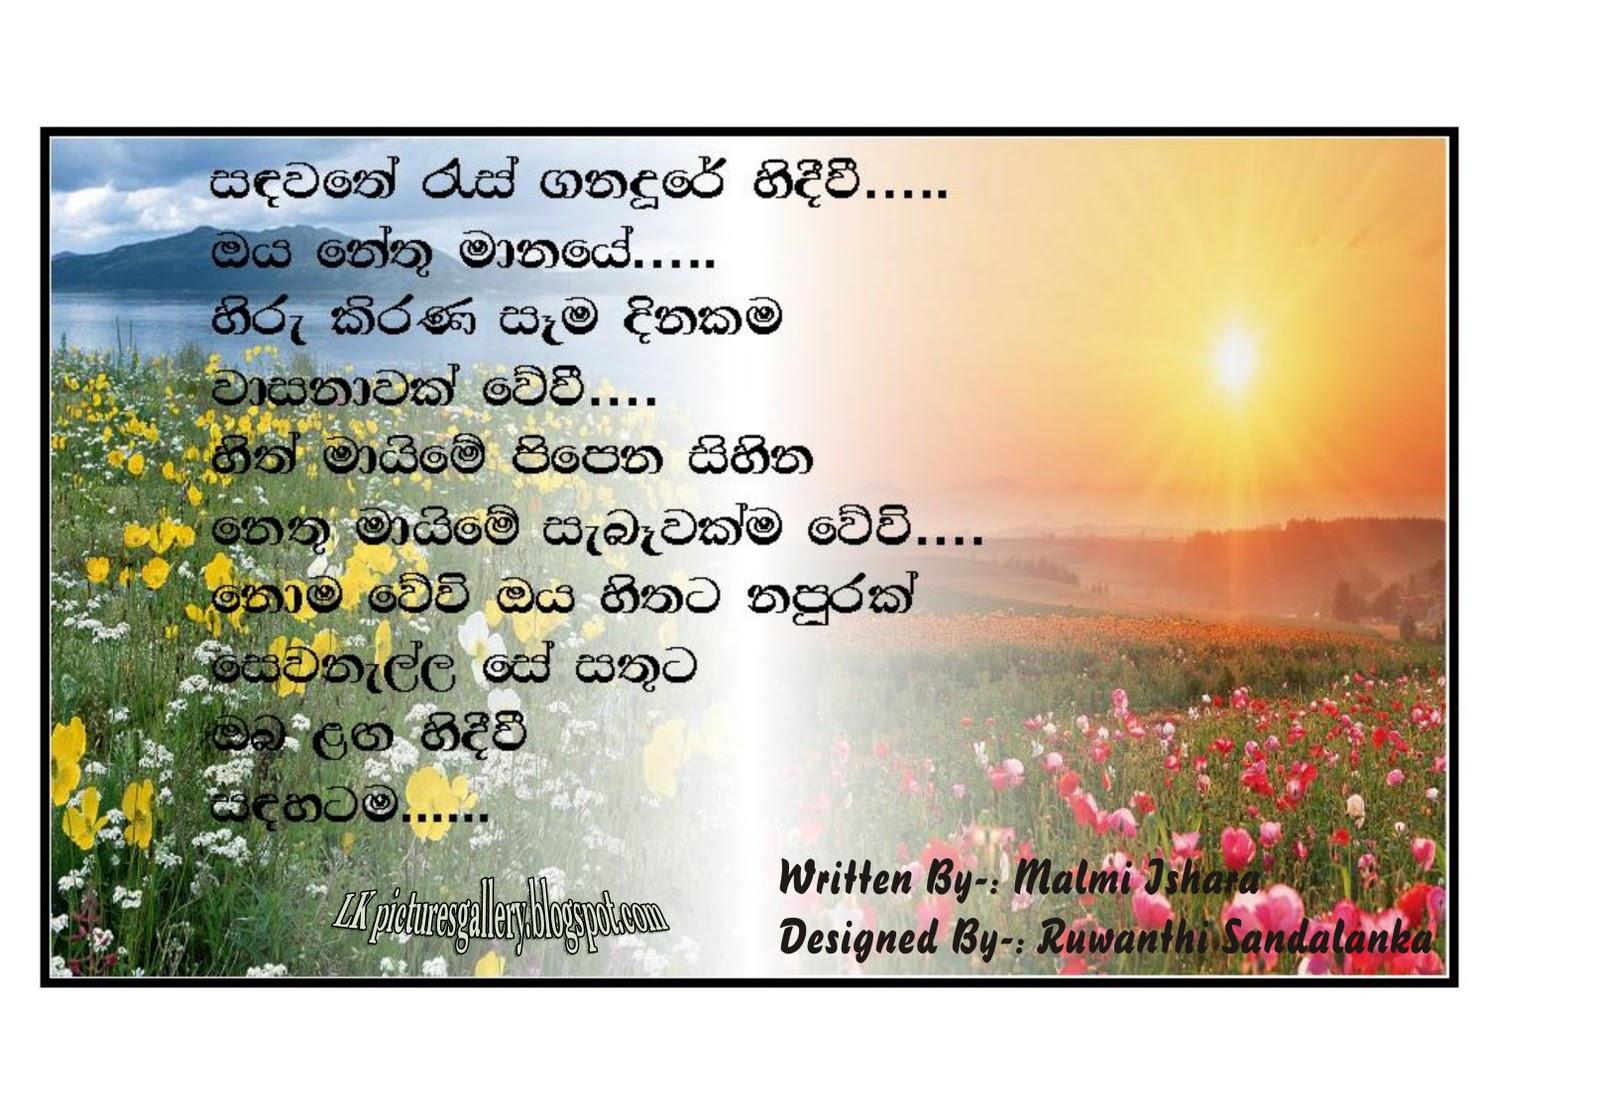 Jeewithaya Yanu Nisadas: Sinhala Quotes About Teachers